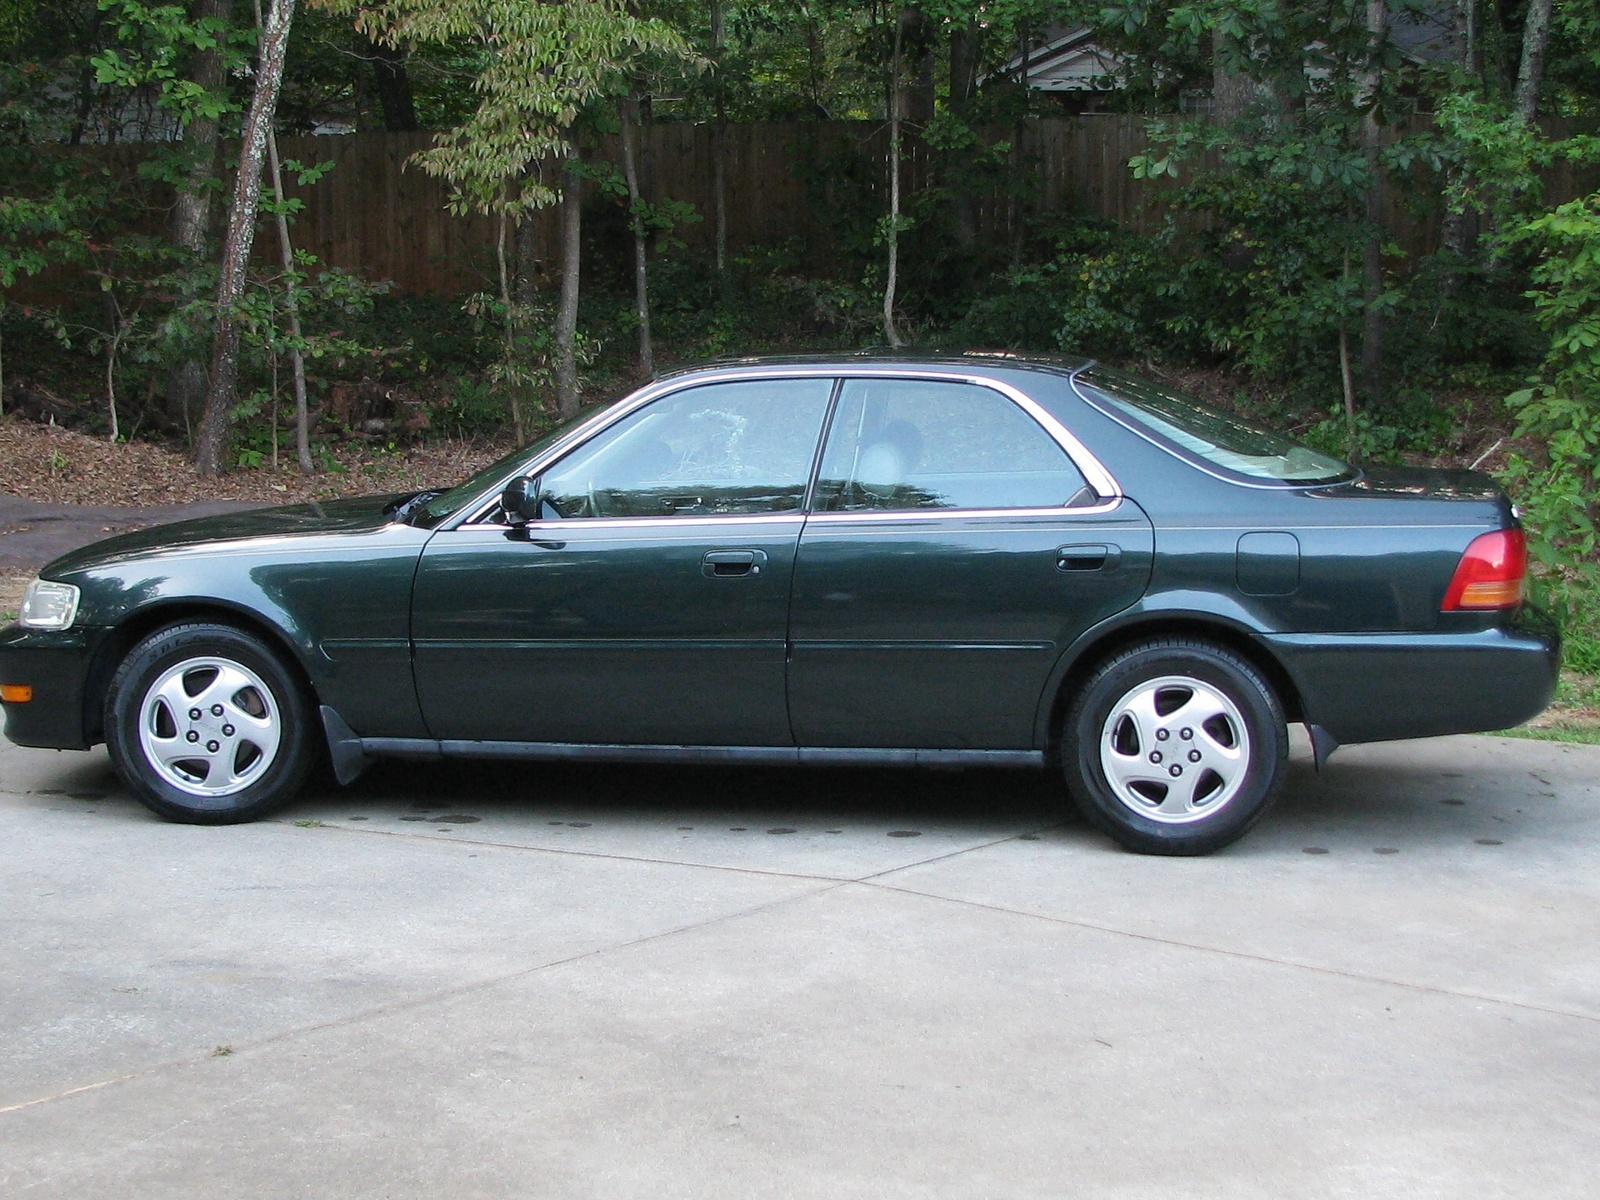 1997 Acura Tl >> 1997 ACURA TL - Image #9